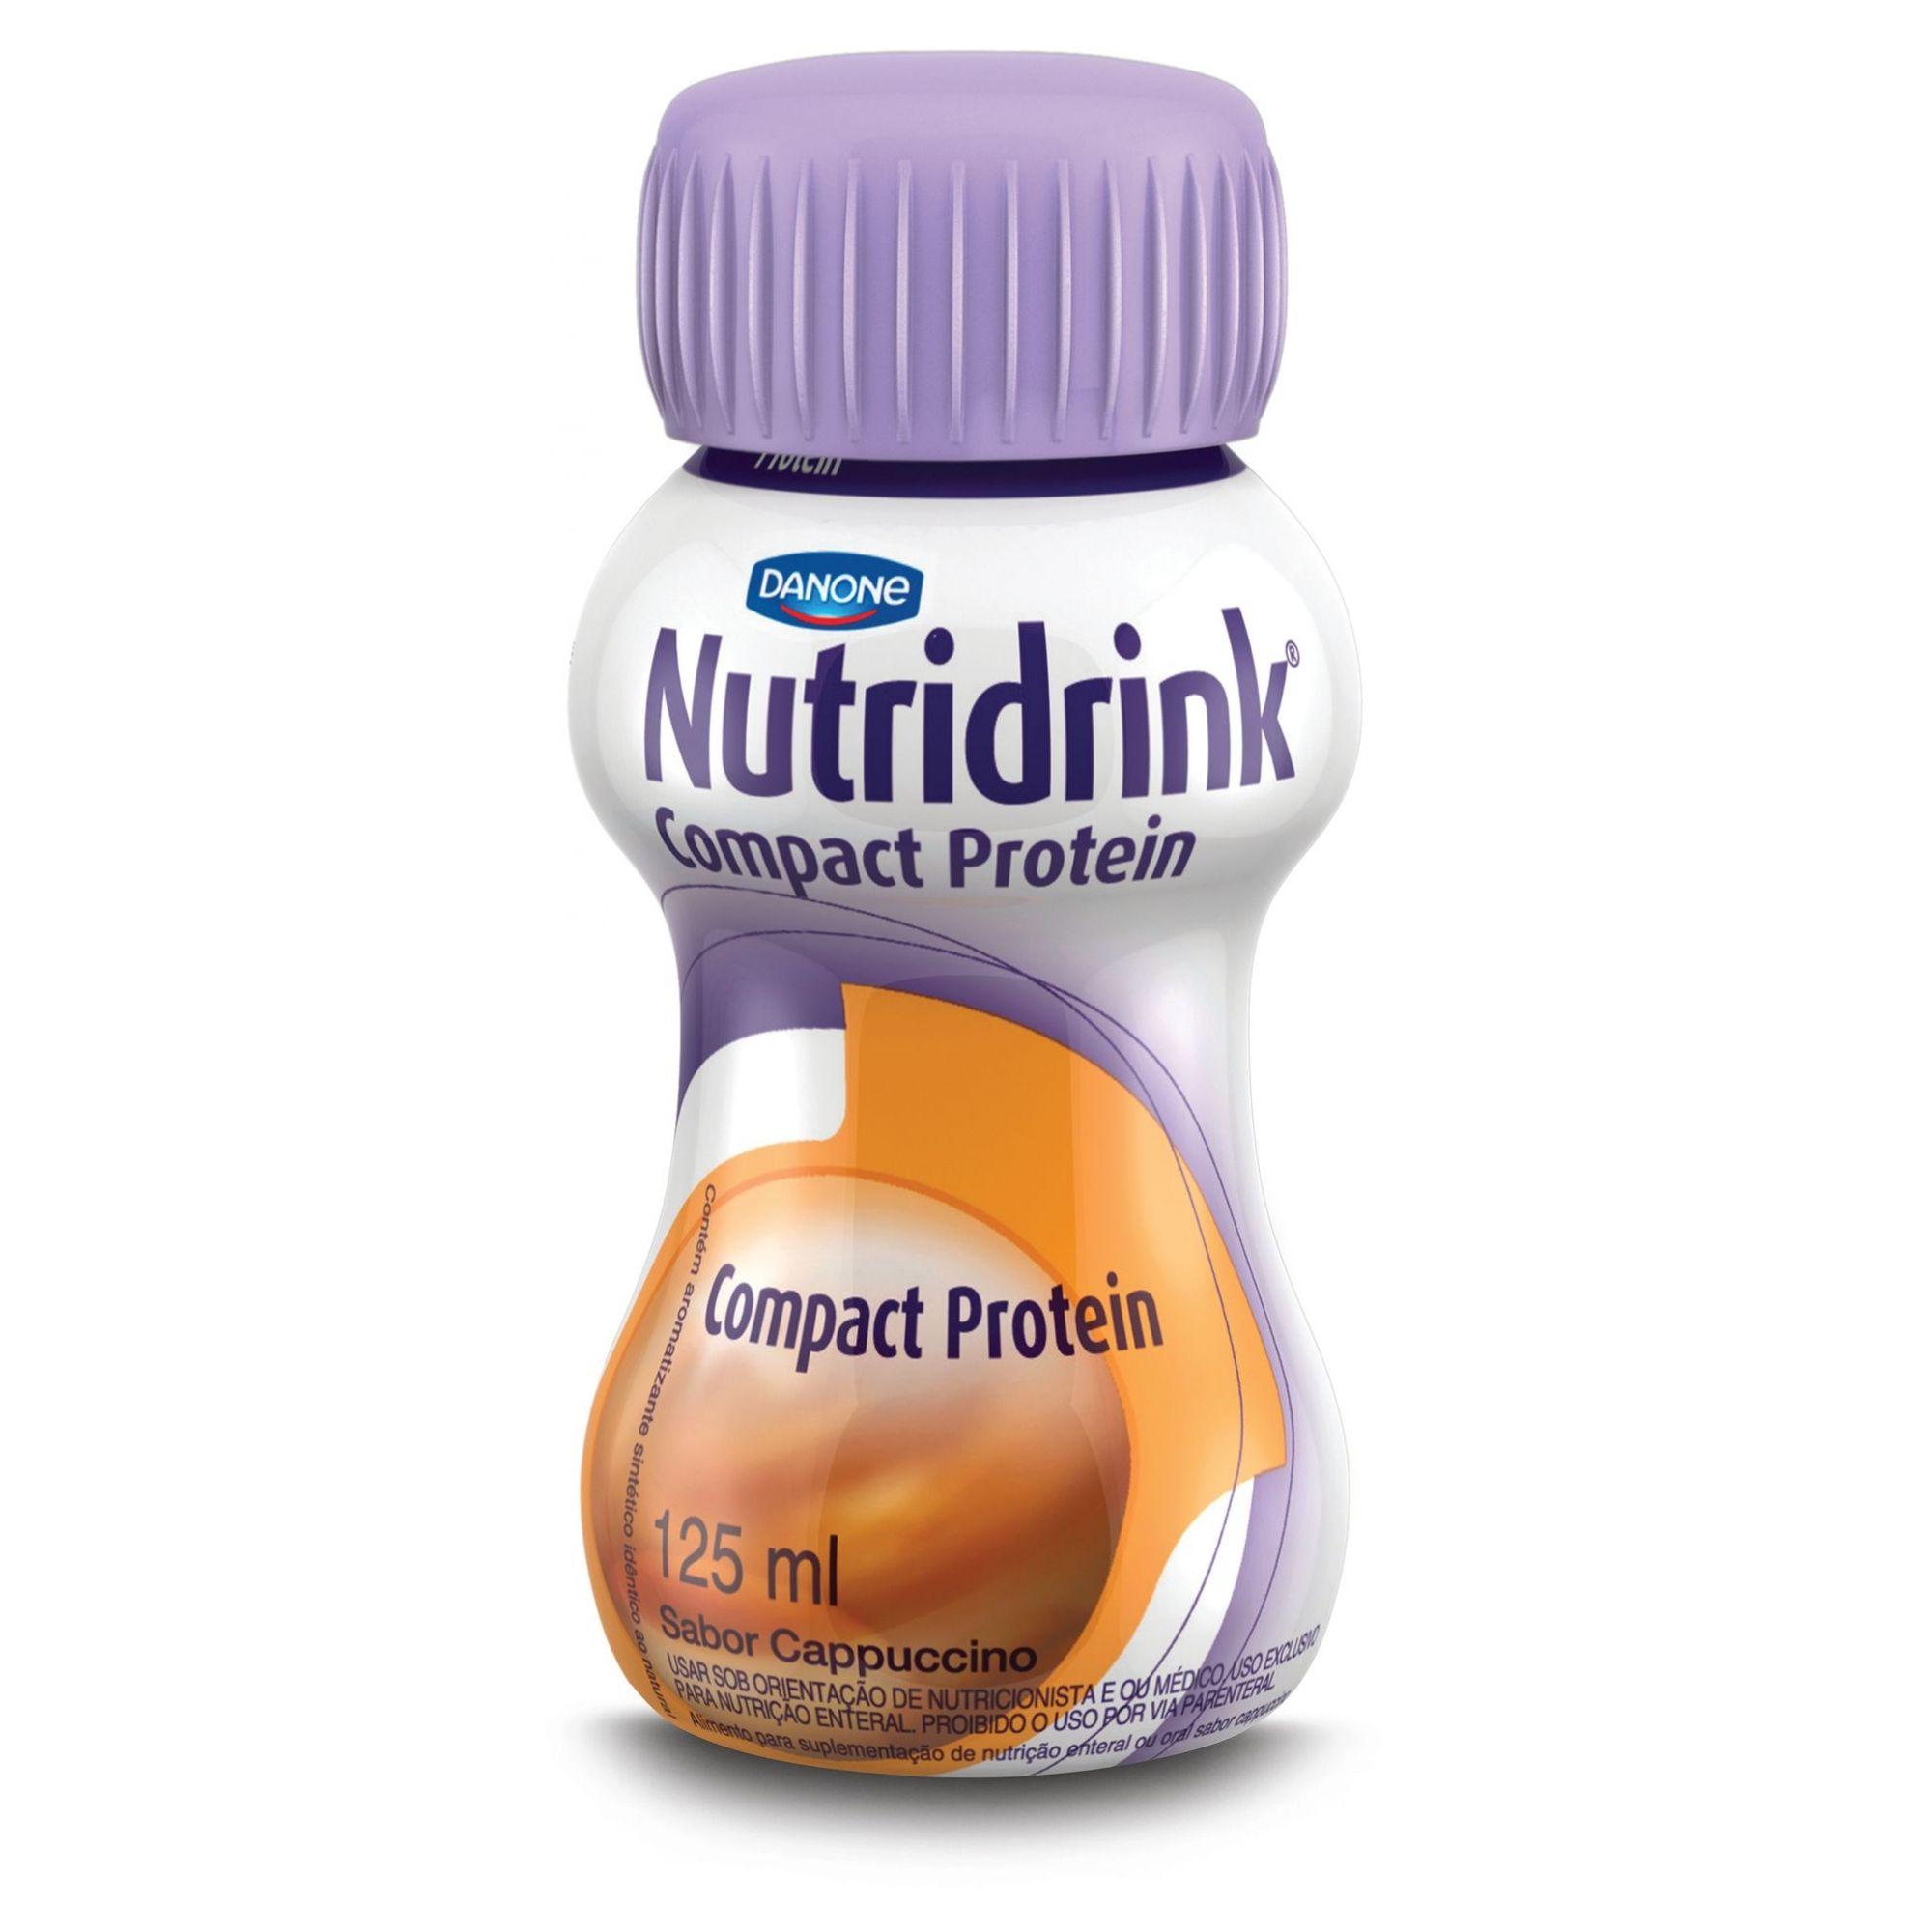 Nutridrink Compact Protein Cappuccinno - 125 mL - (DANONE)